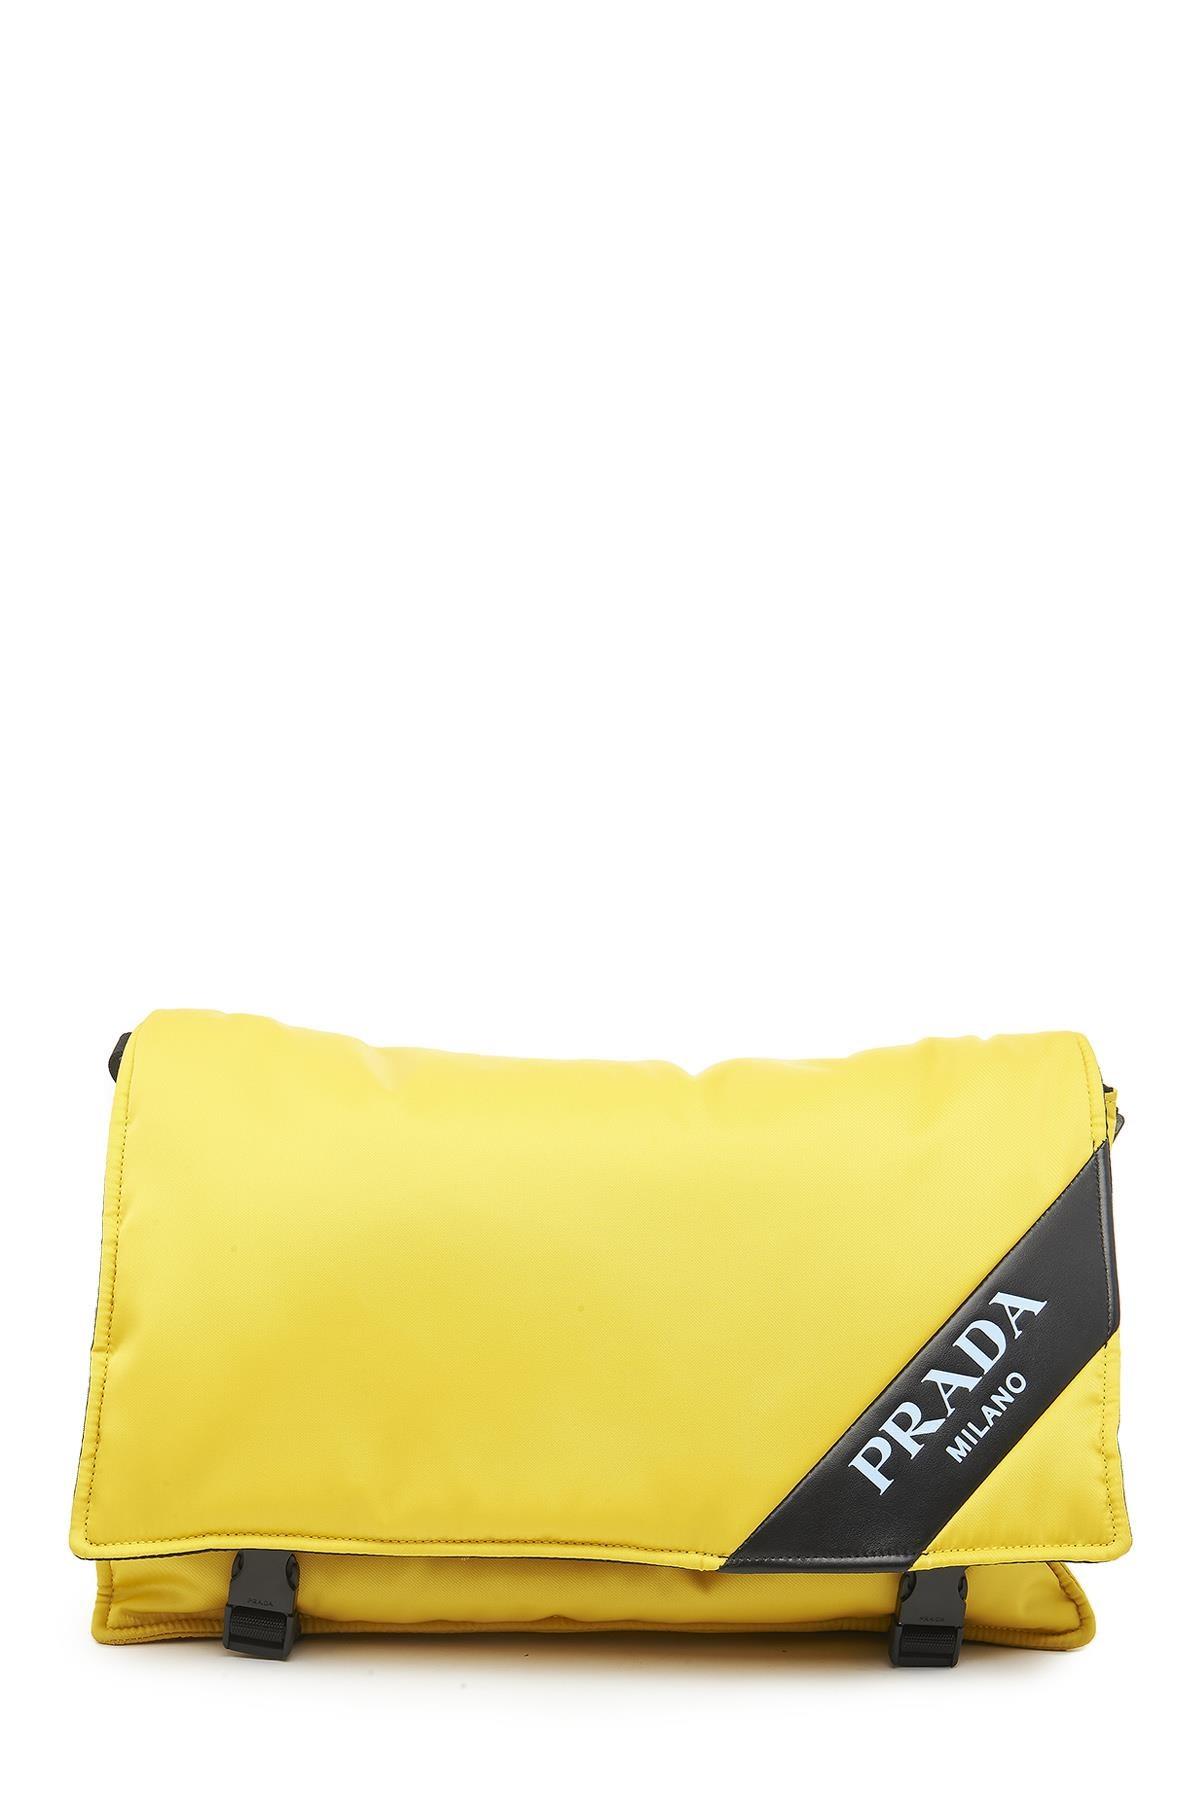 19a479948bfd prada 'messenger' crossbody bag available on julian-fashion.com - 50144